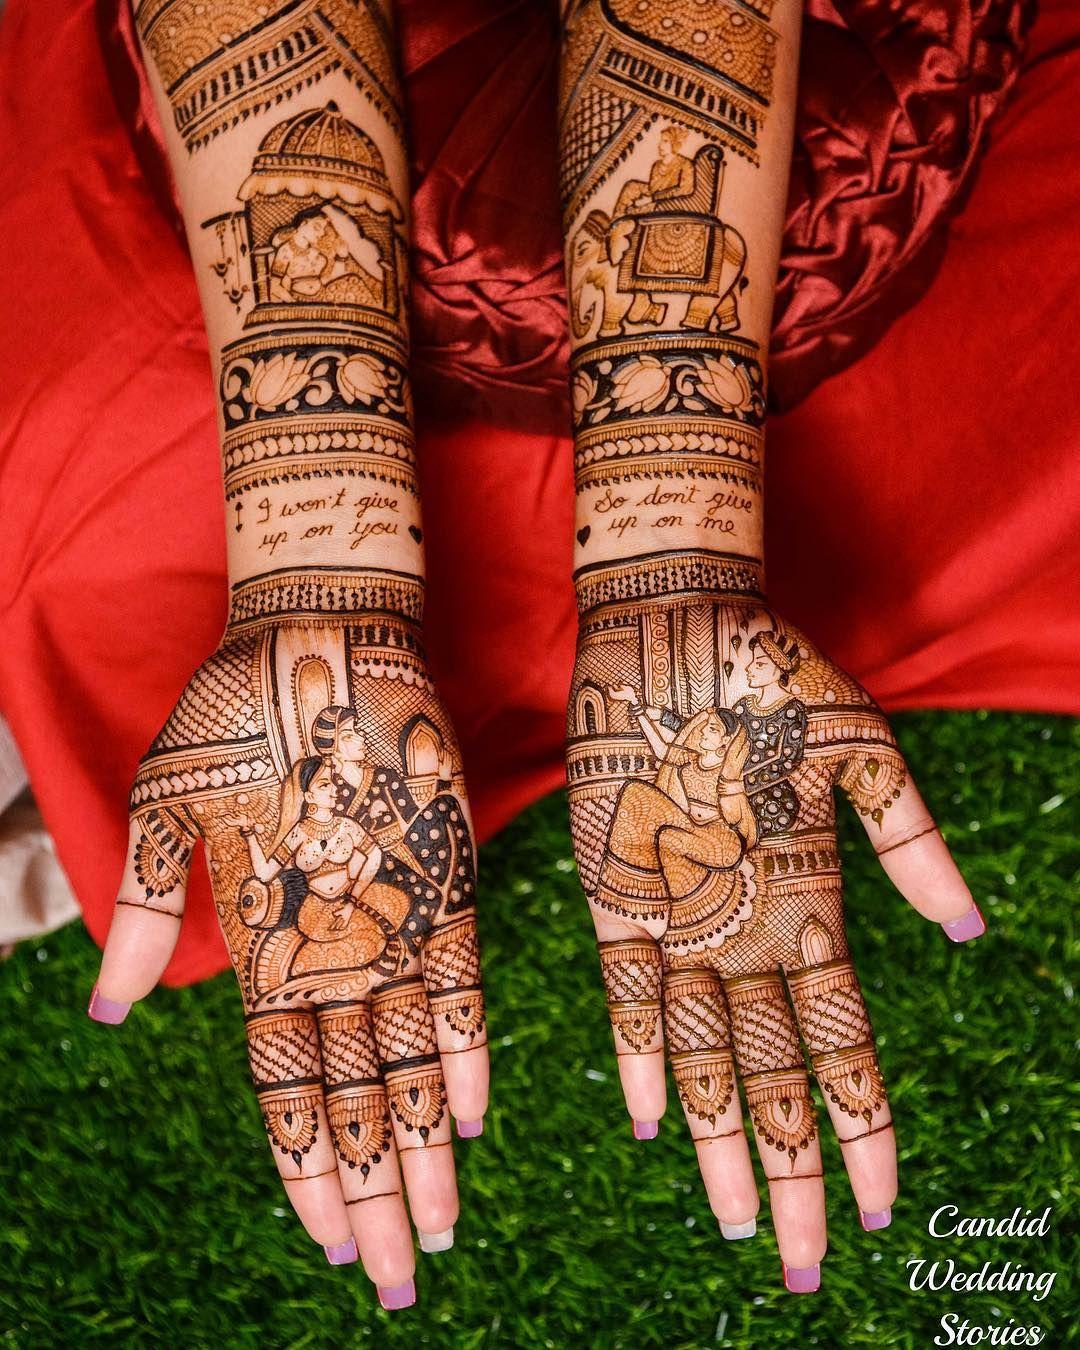 PunjabKesari, Nari, Latest and Simple Mehndi Design Image, लेटेस्ट एंड सिंपल पोट्रेट मेहंदी डिजाइन इमेज